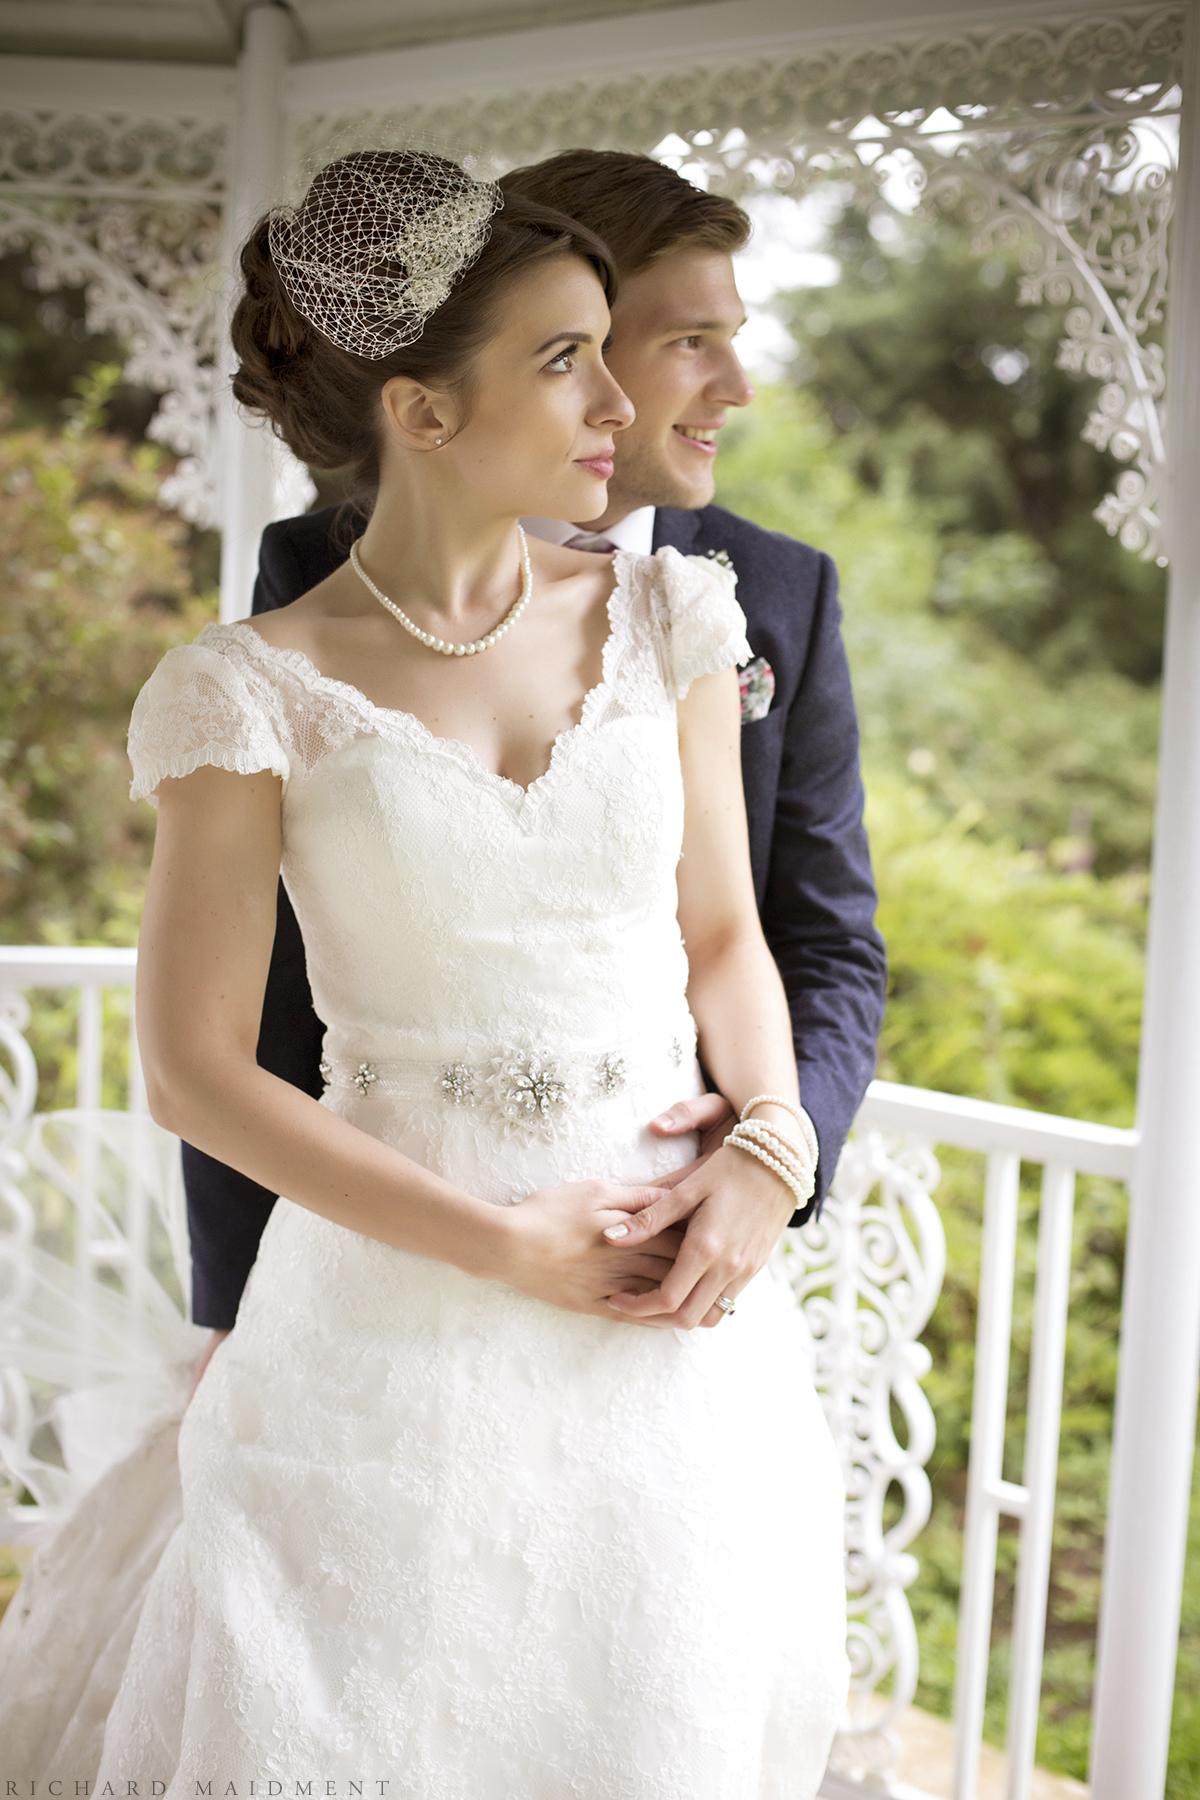 Richard Maidment - Wedding Photography (3).jpg